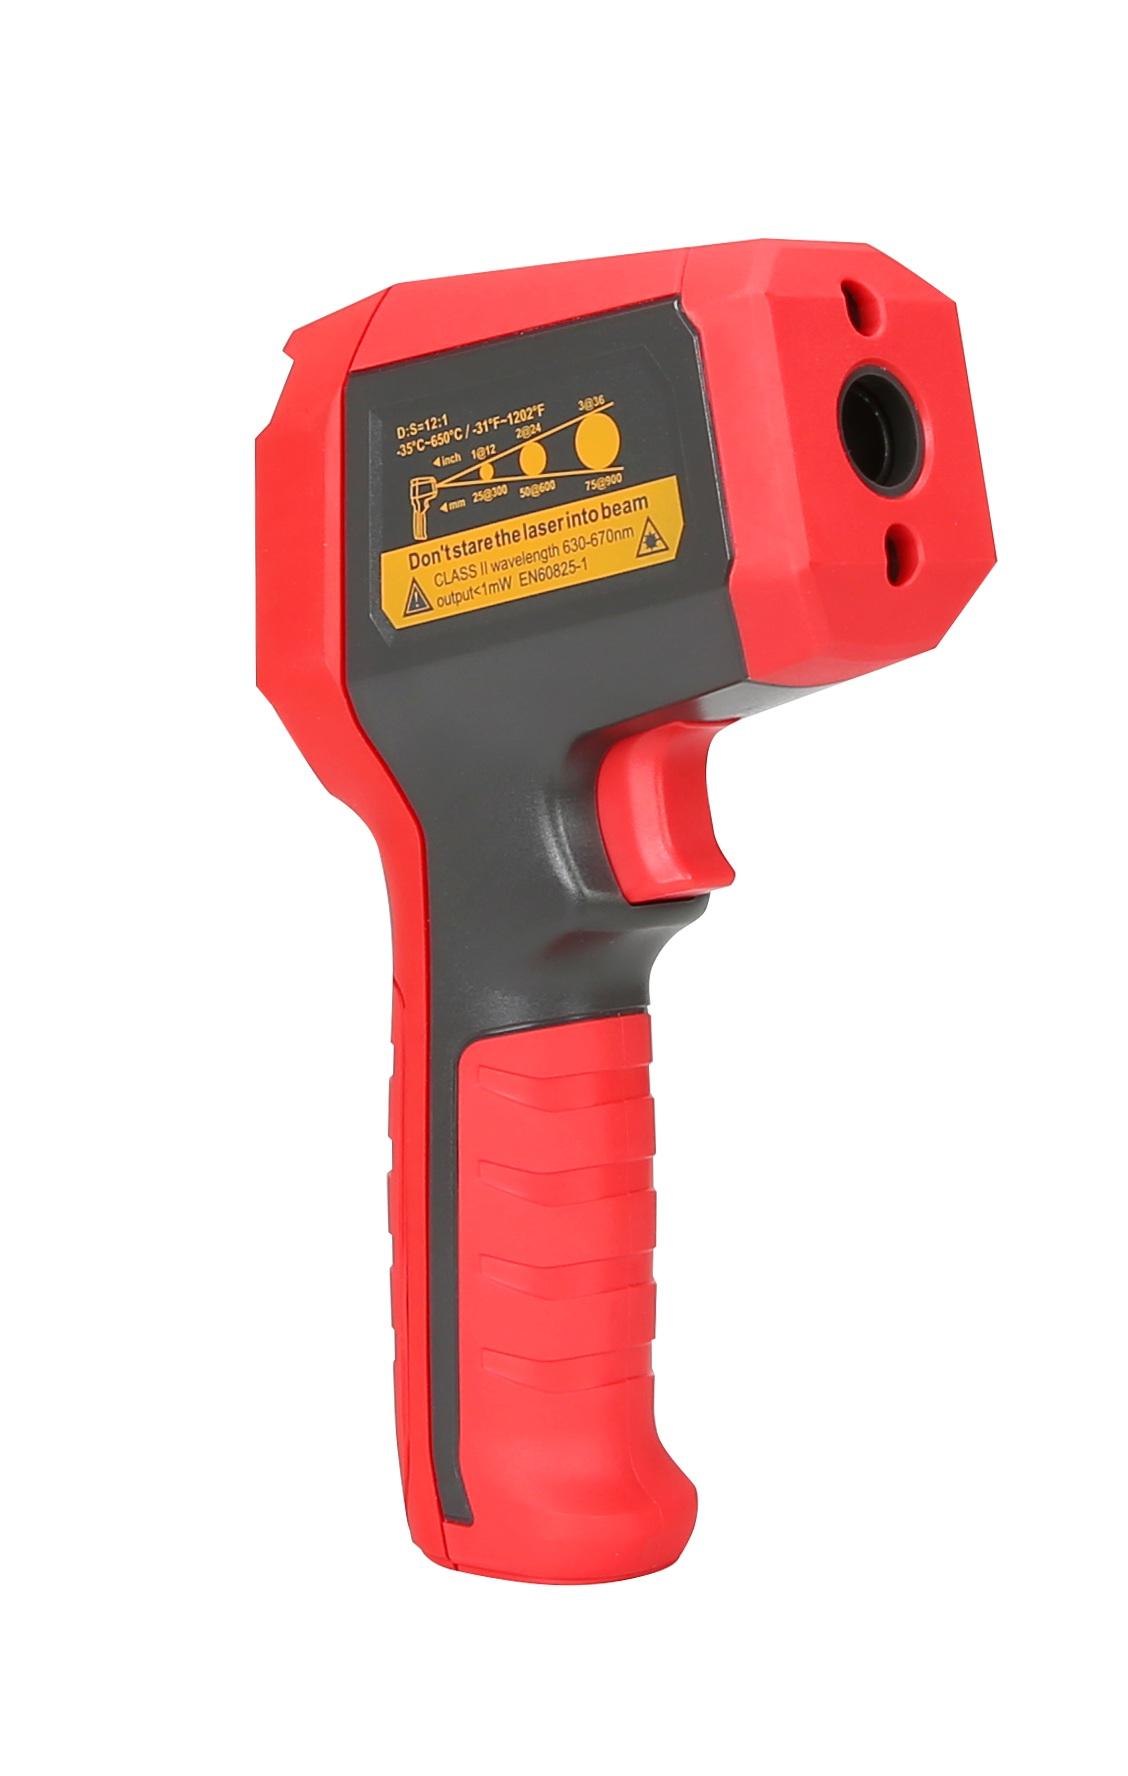 UT309C Unit PRO, pirometr, miernik temepratury, cyfrowy termometr, podwójny laser, termometr laserowy, UT-309C